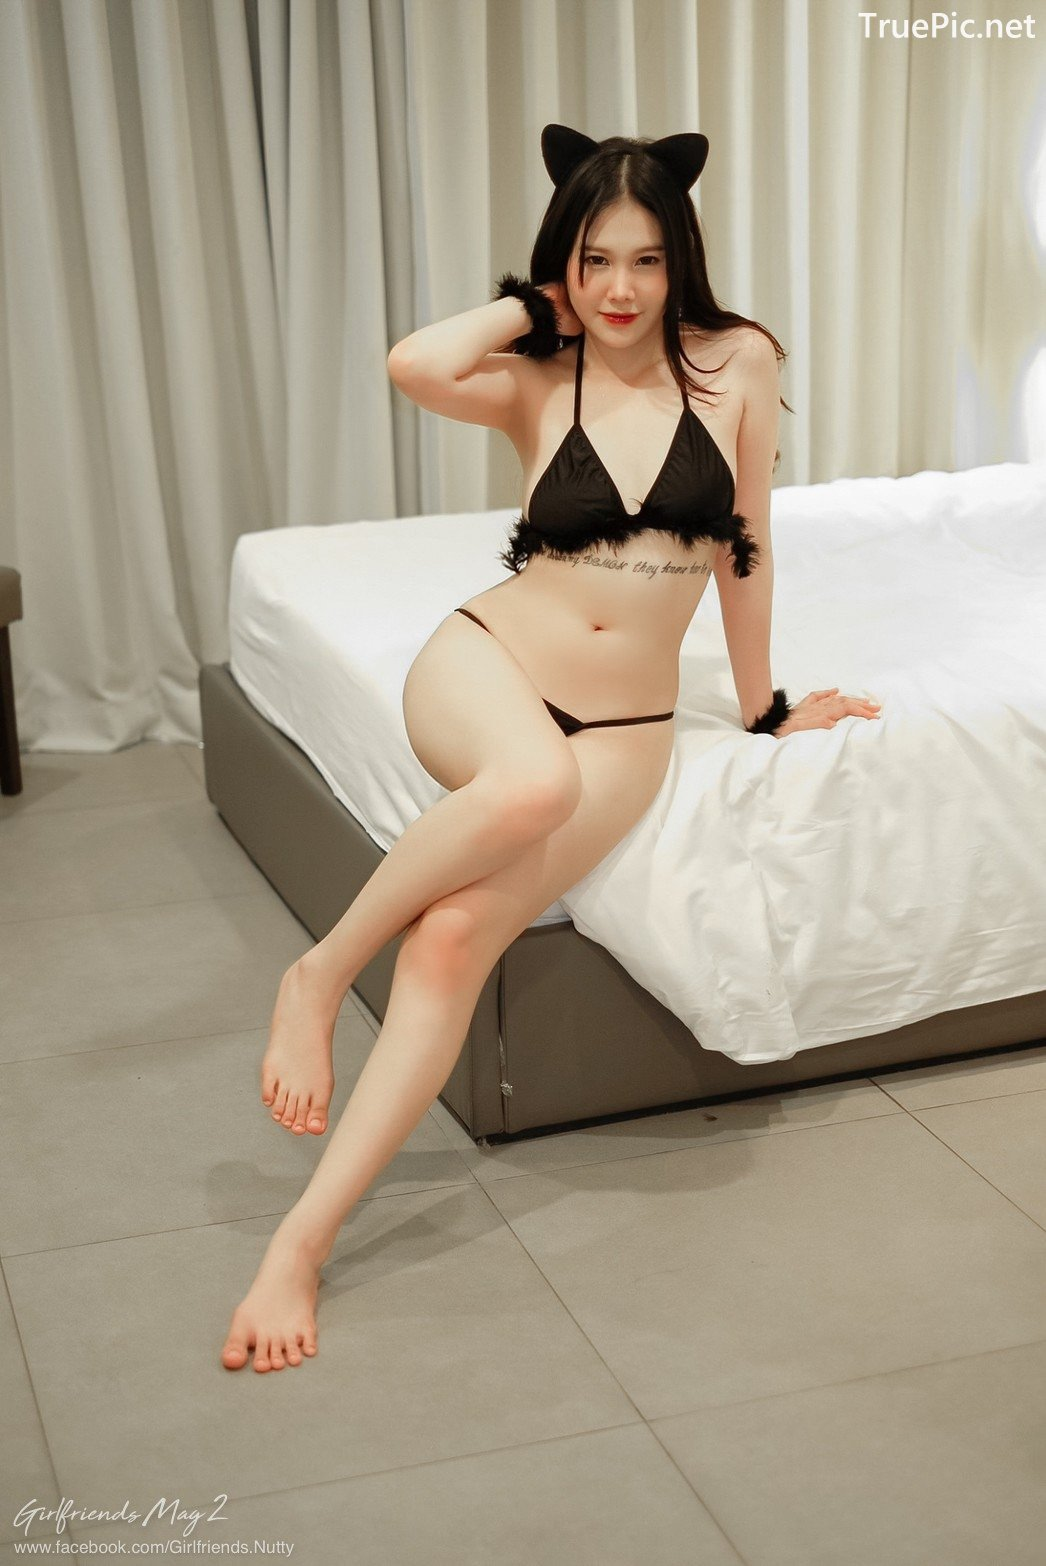 Image Thailand Model - Chanunshida Phuangsombut - Sexy Black Cat - TruePic.net - Picture-9